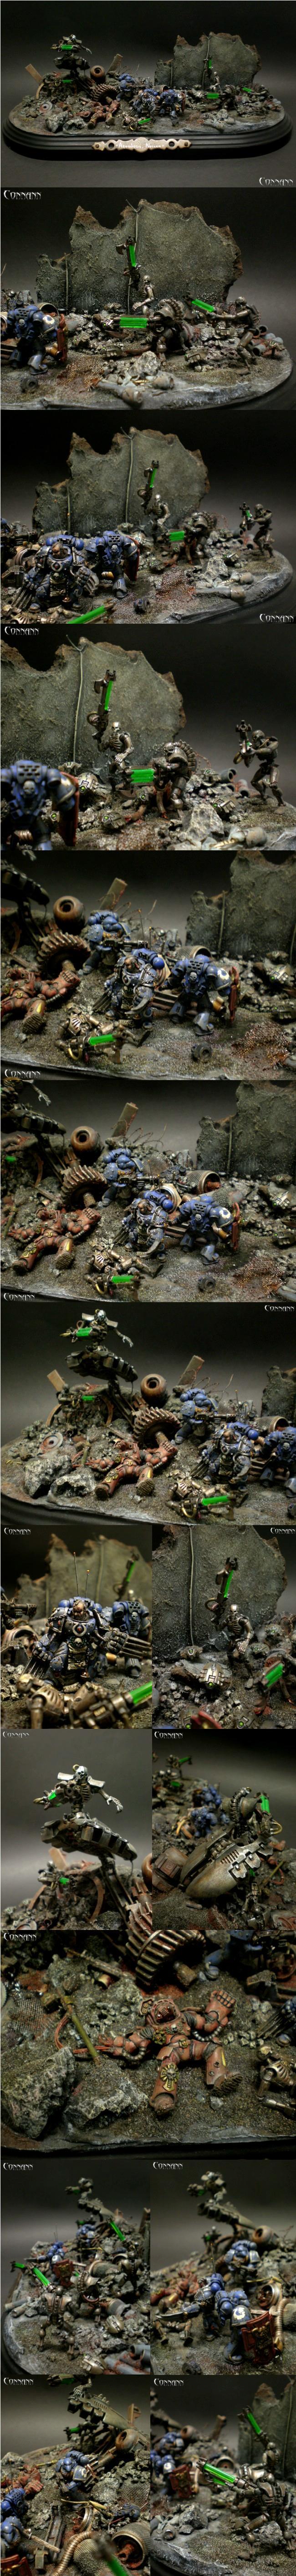 28mm, Diorama, Necrons, Space Marines, Ultramarines, Warhammer 40,000